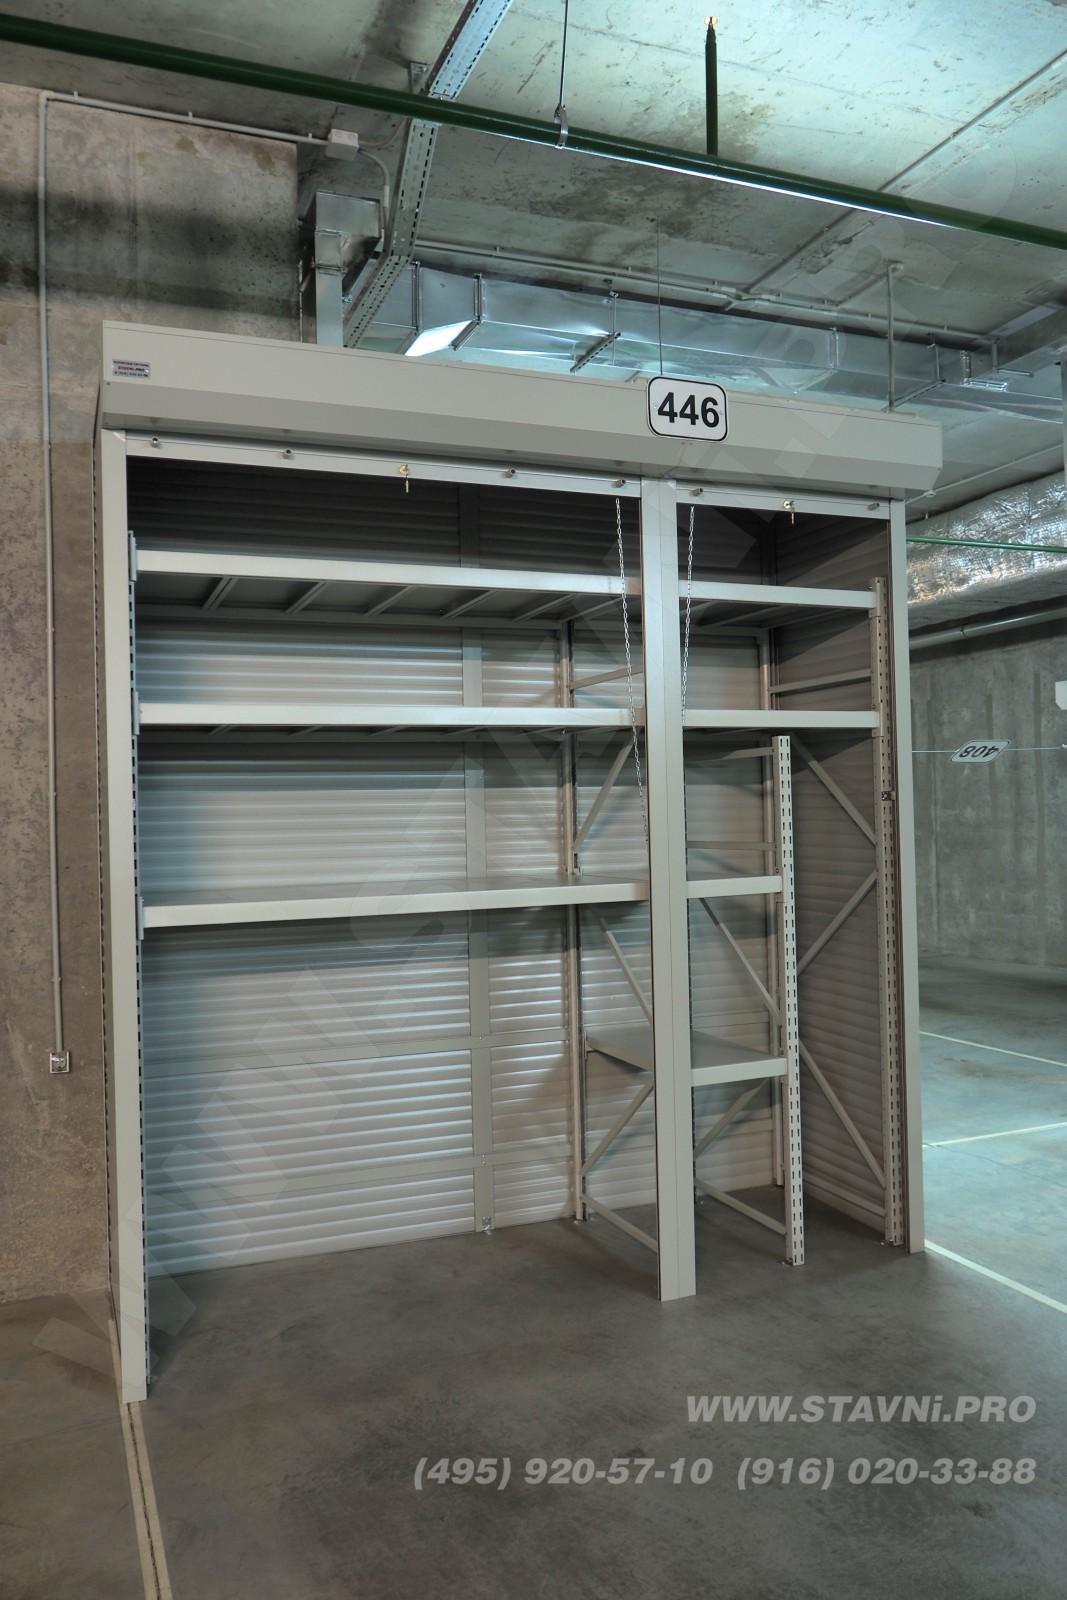 Фото установленного шкафа для колес в Скайфорте вид слева